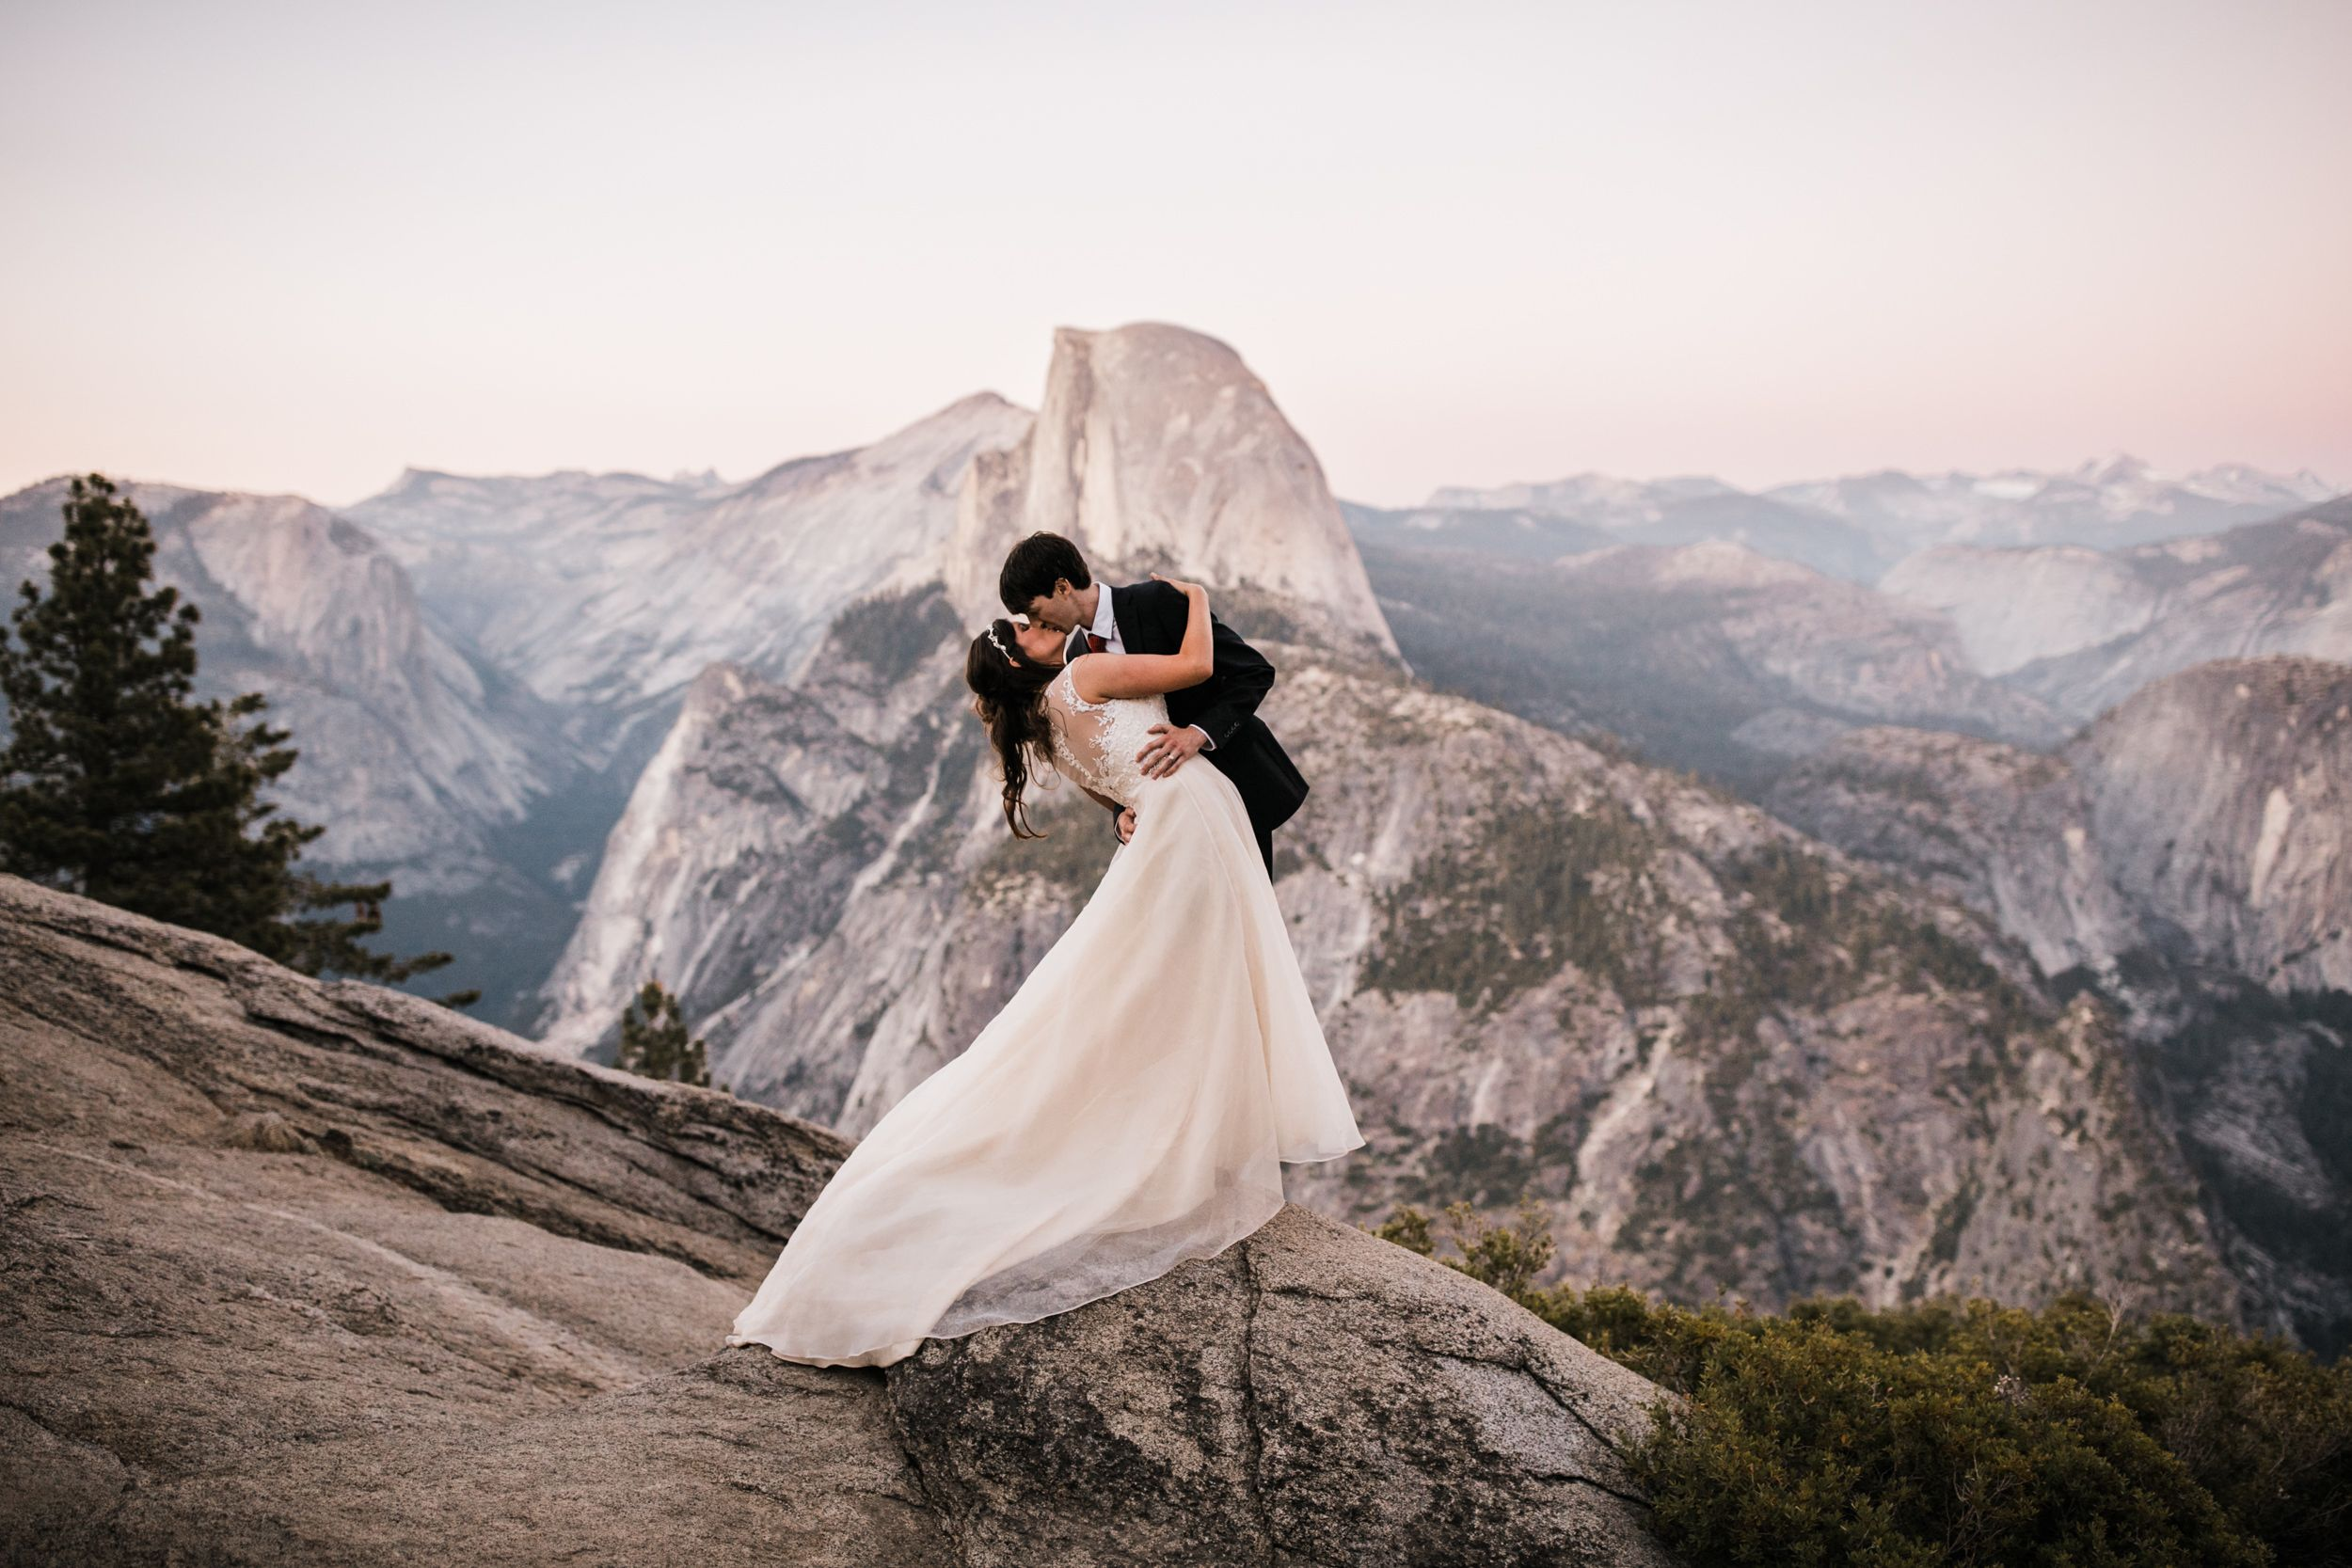 Yosemite National Park Adventure Elopement Yosemite Wedding Photographer Adventure Wedding Elopement Photographers In Moab Yosemite And Beyond The Hea Yosemite Wedding Adventure Wedding Elopement Photographer